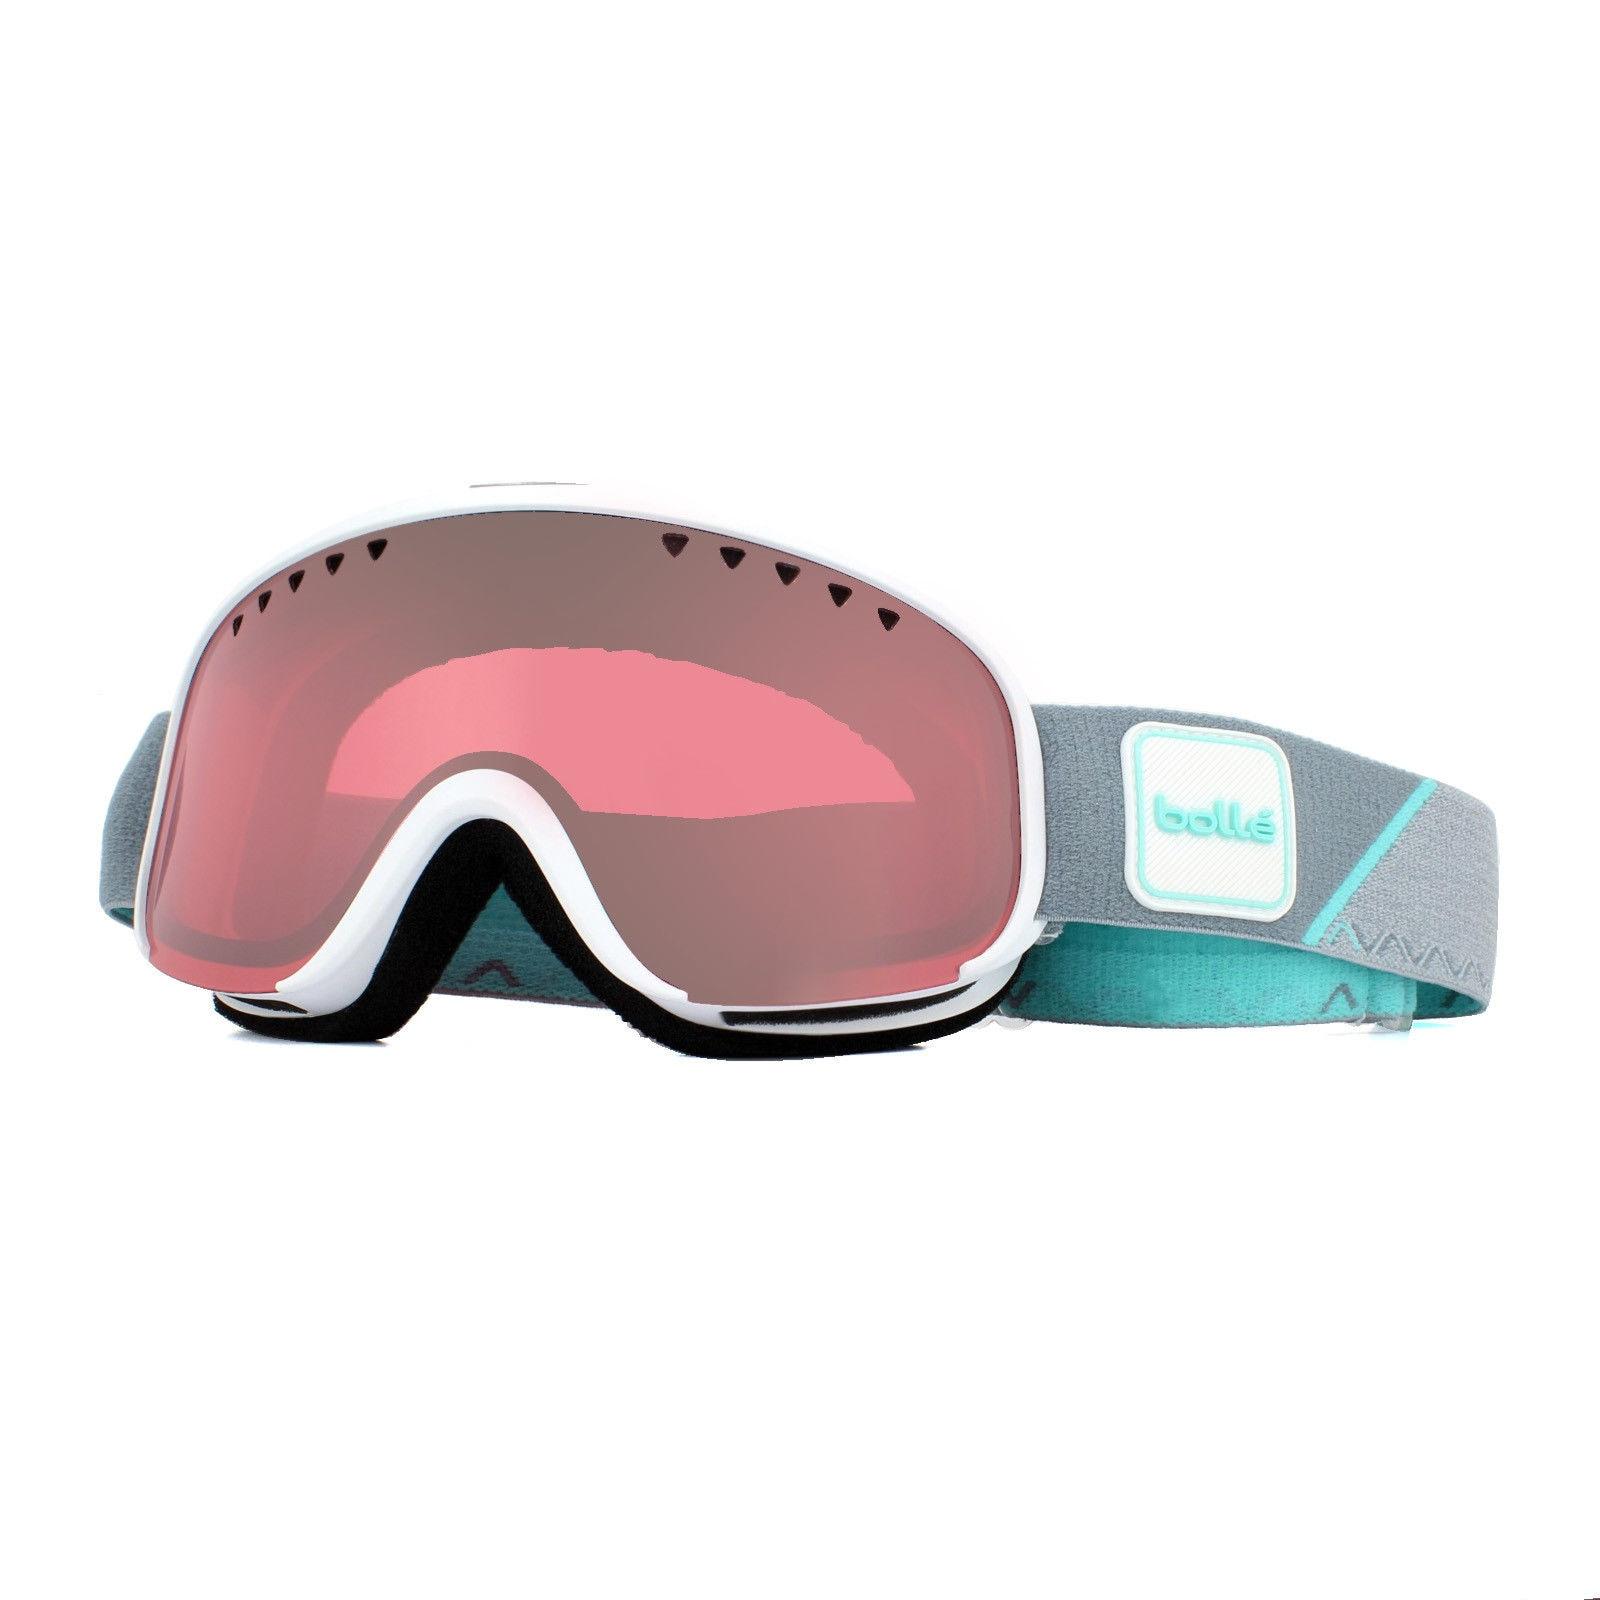 Fotografie Ochelari ski Bolle Scarlett, White/Mint